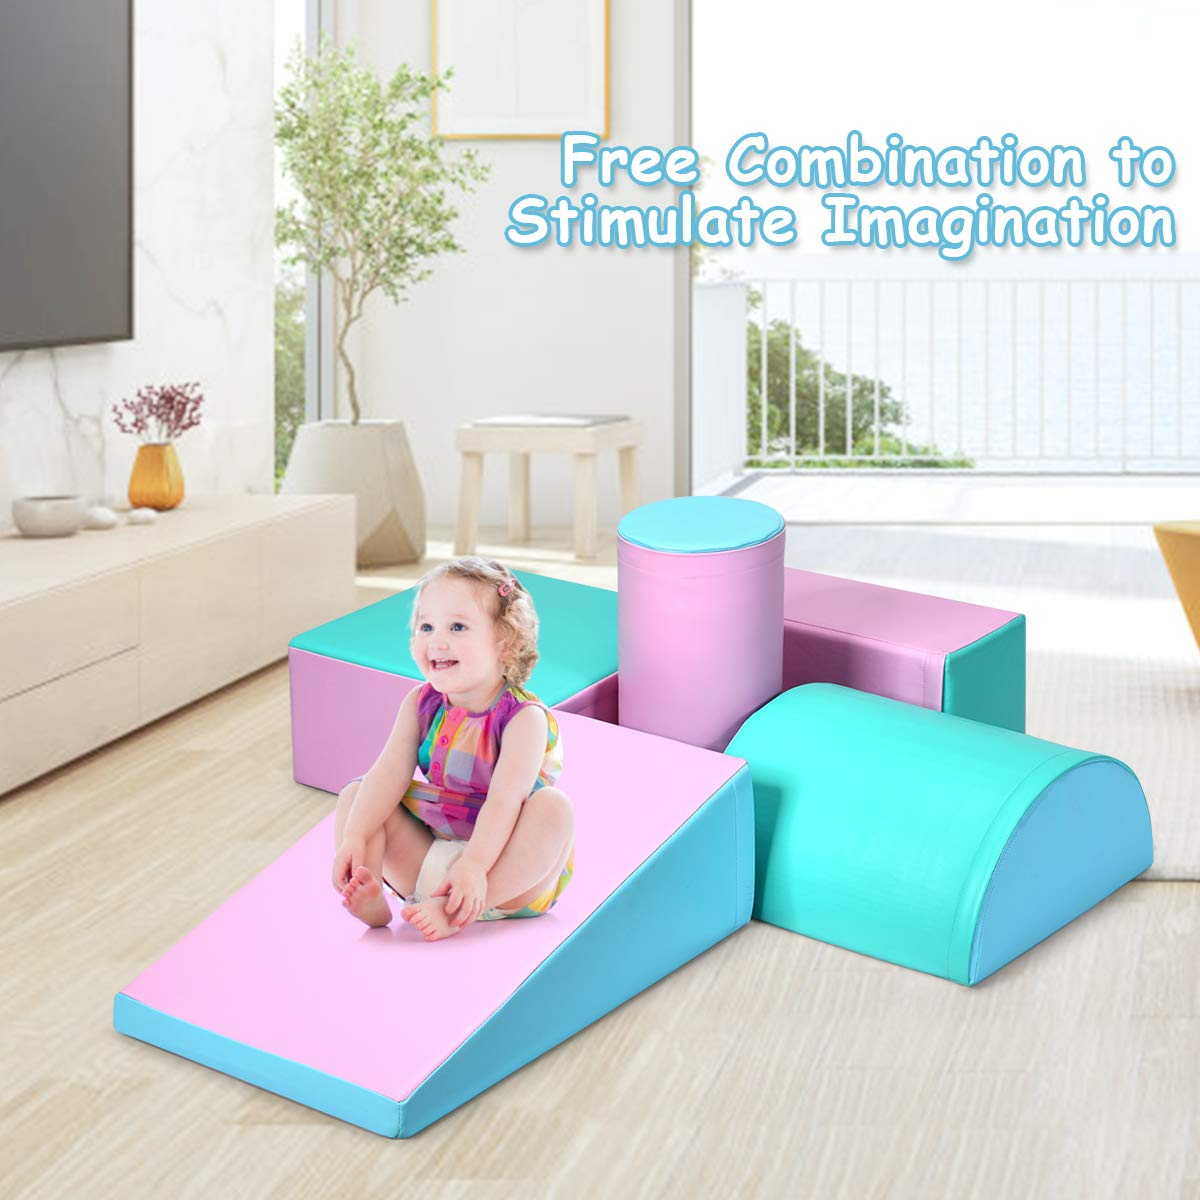 Amazon.com: Costzon Climb and Crawl Foam Set, 5-Piece Soft ...